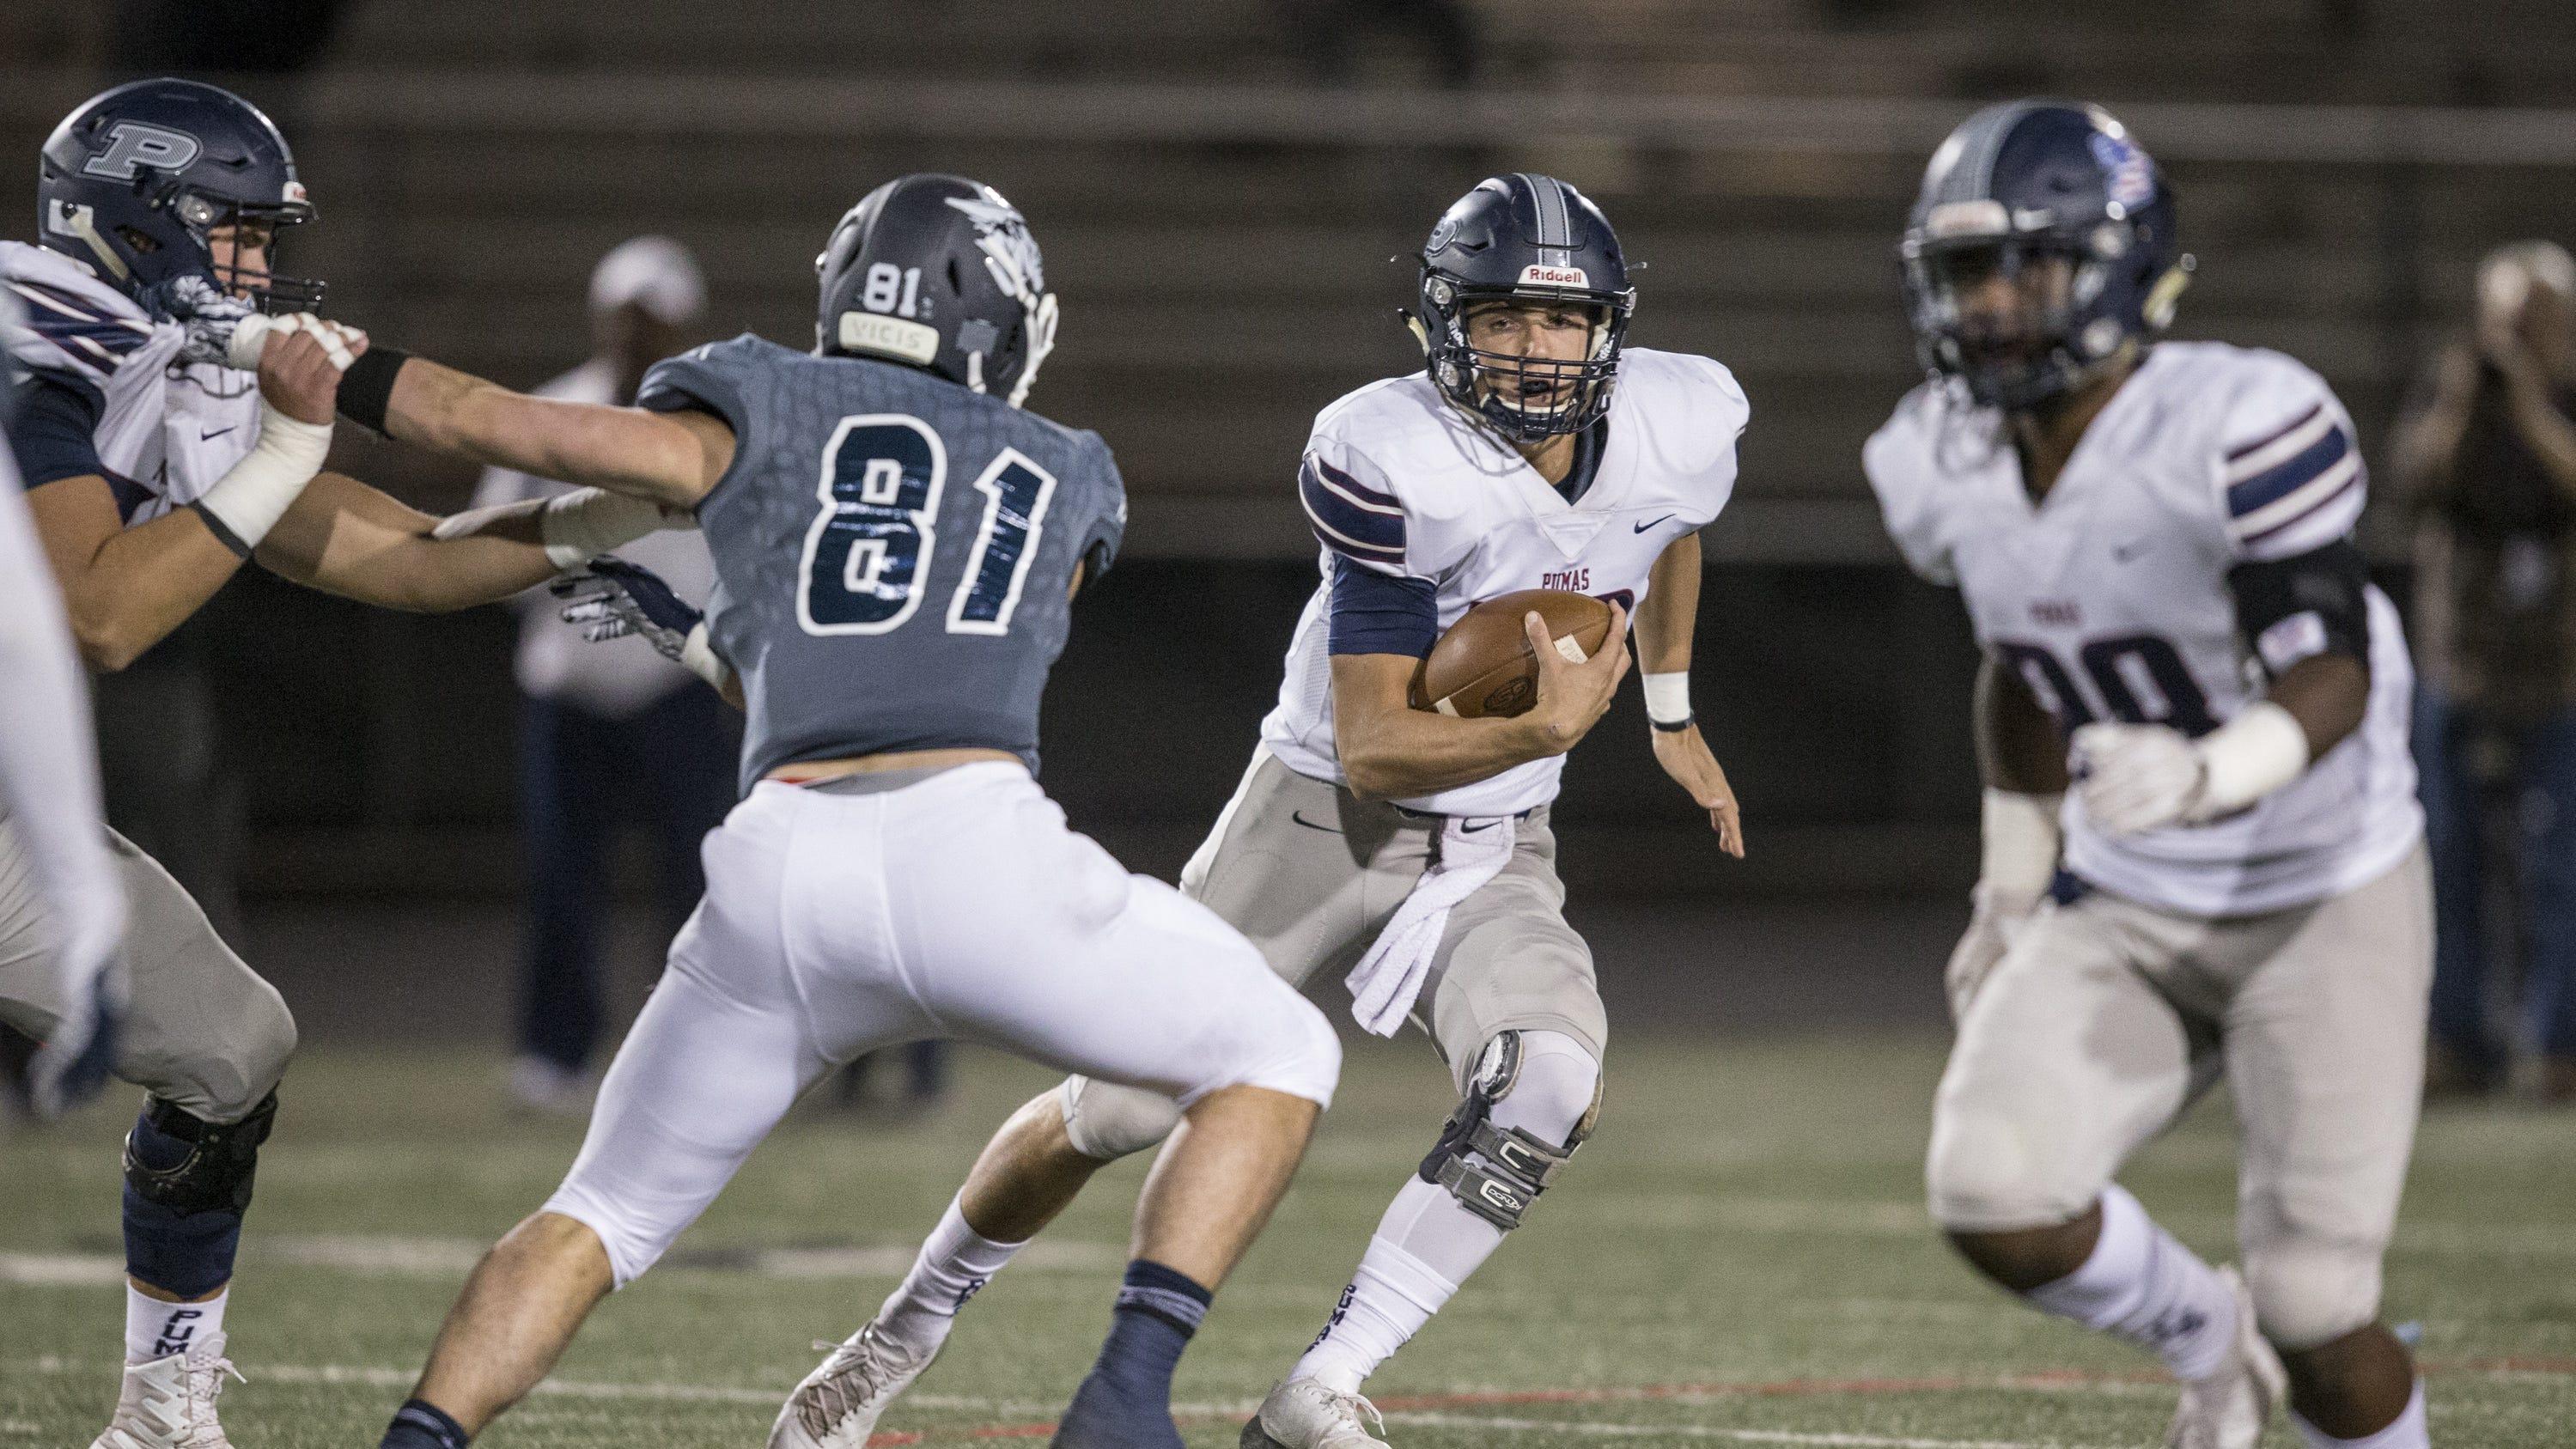 Arizona High School Football Perry Dominates Pinnacle To Meet Chandler